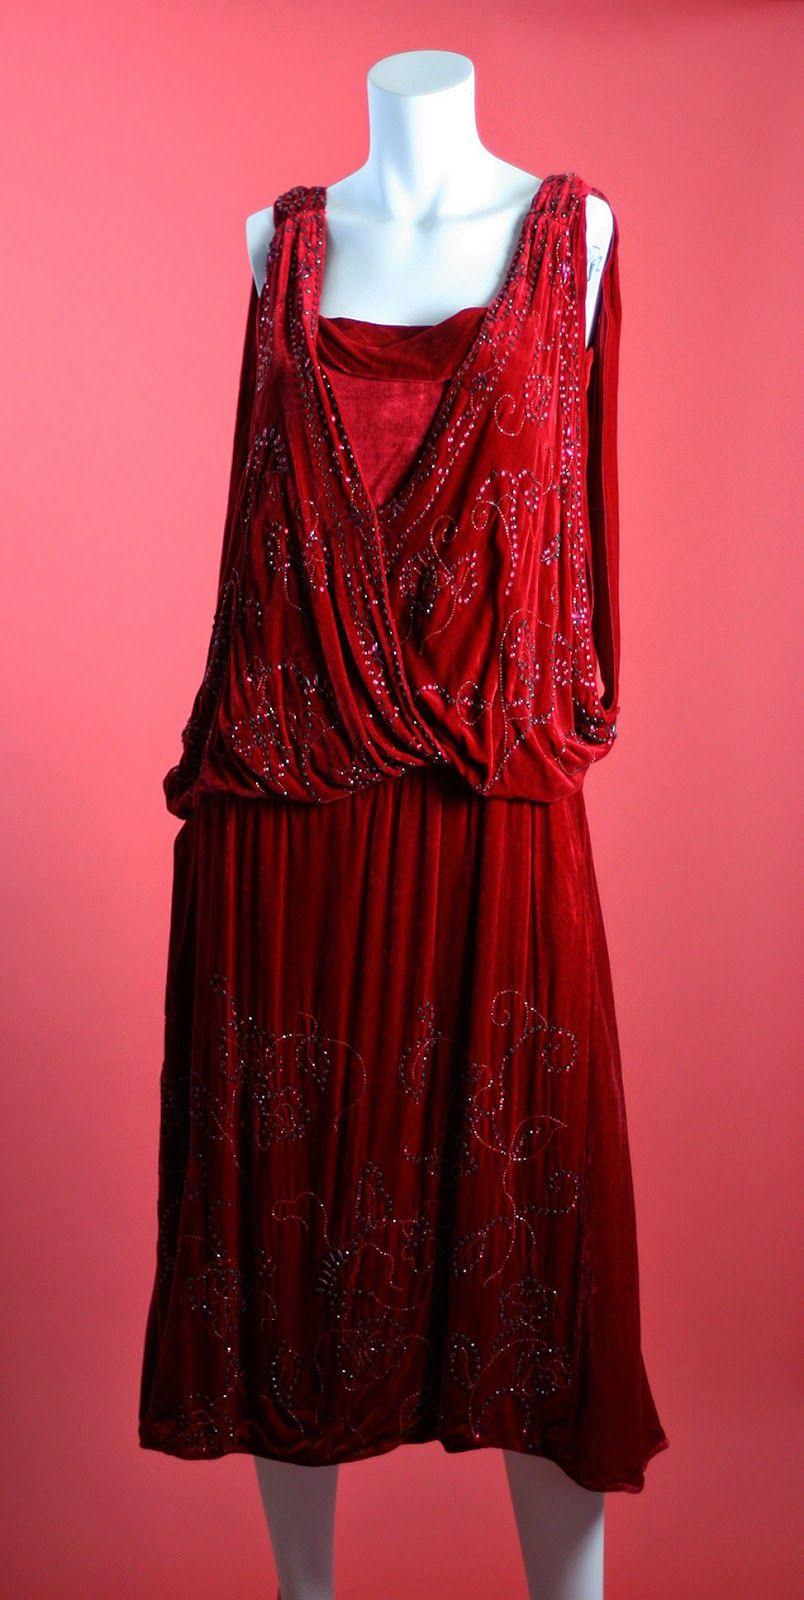 Lisa ho red evening dress